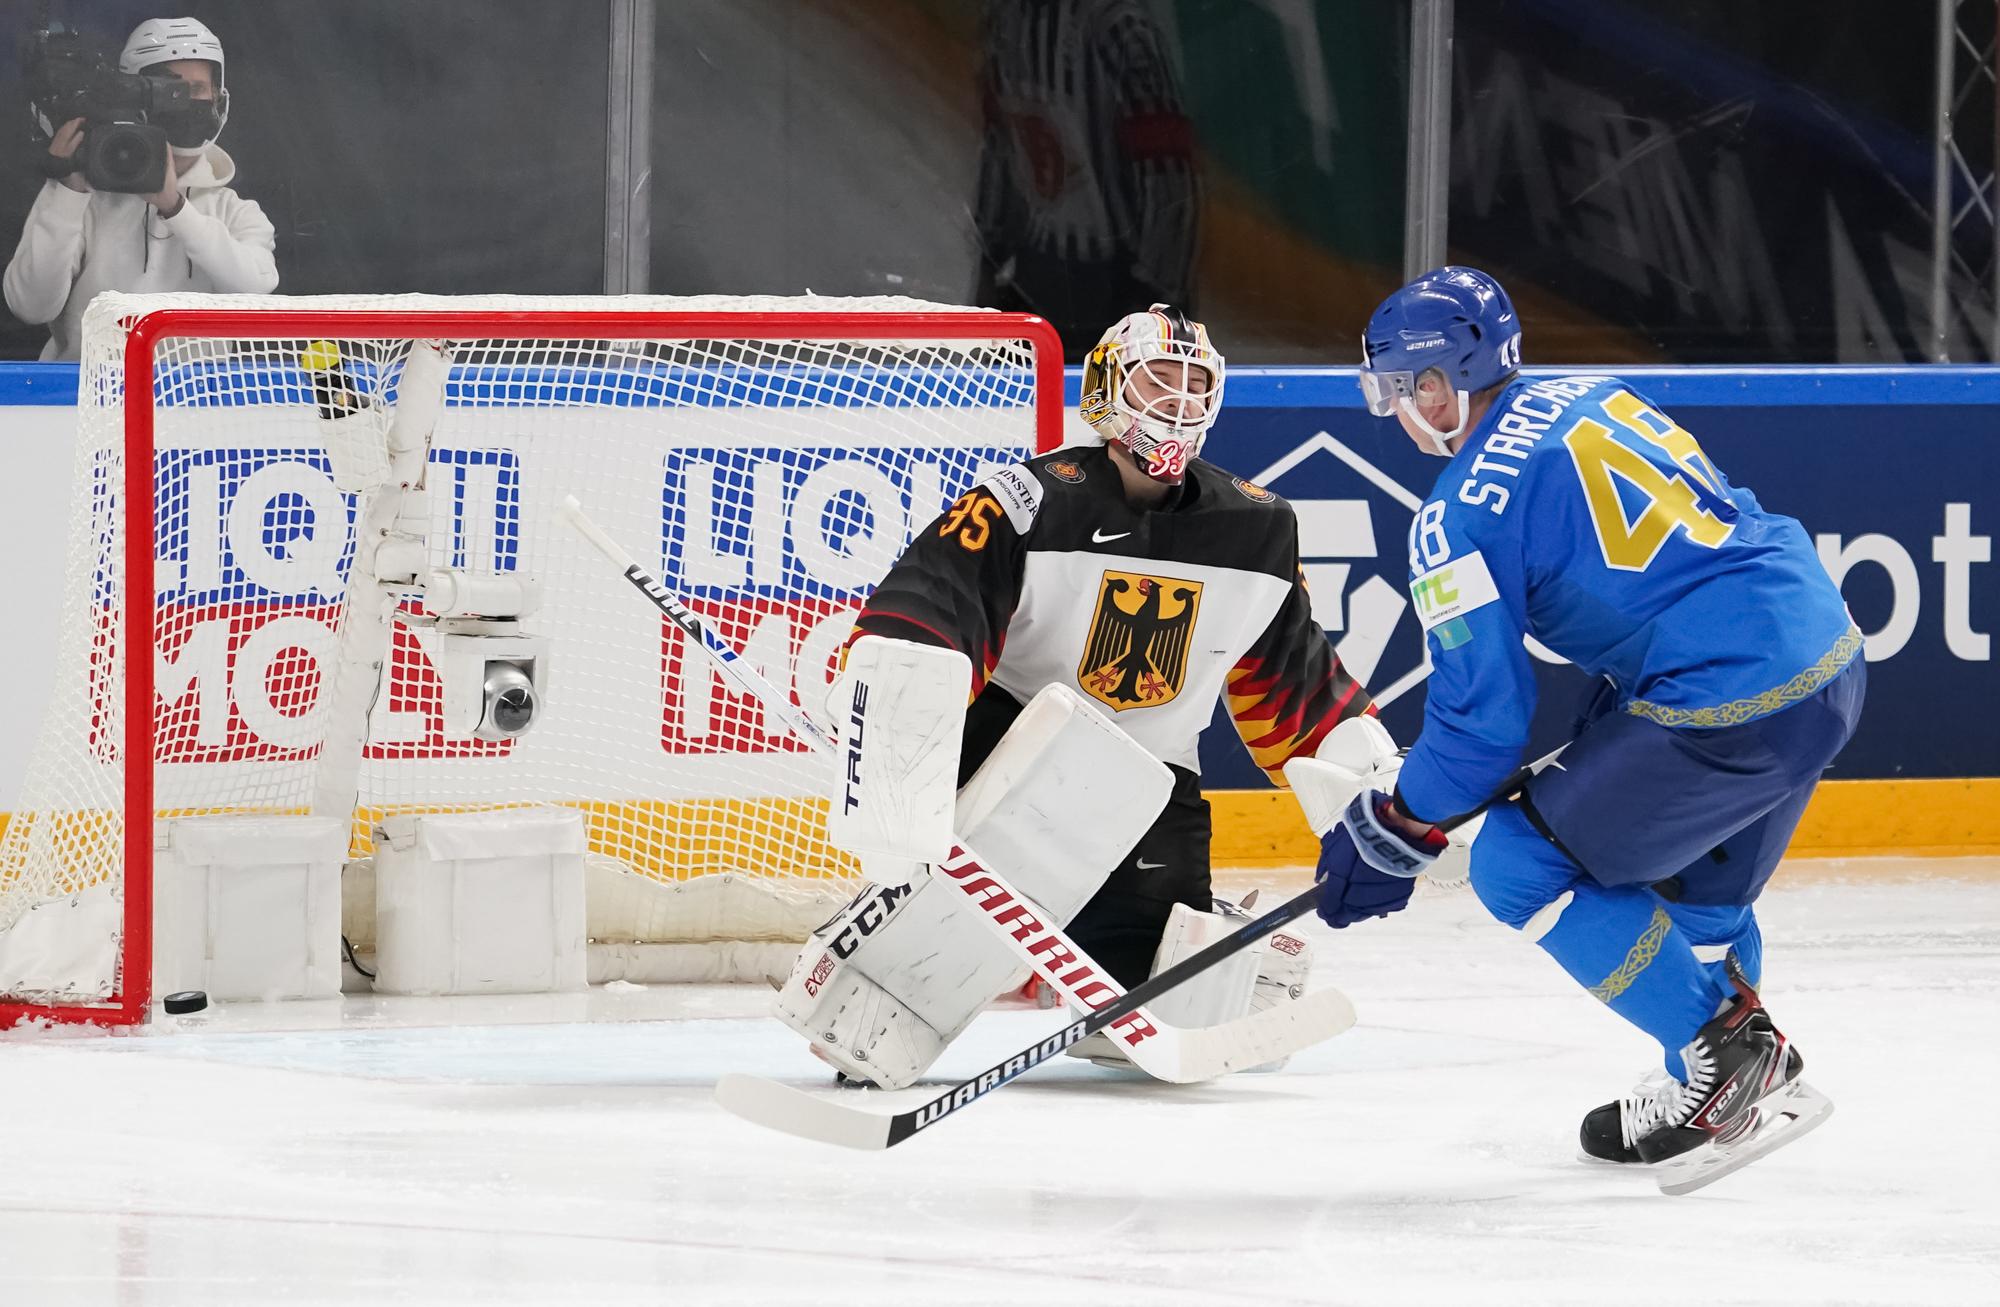 Kazakhstan Stops Germany's Machine at Ice Hockey World Championship - The  Astana Times